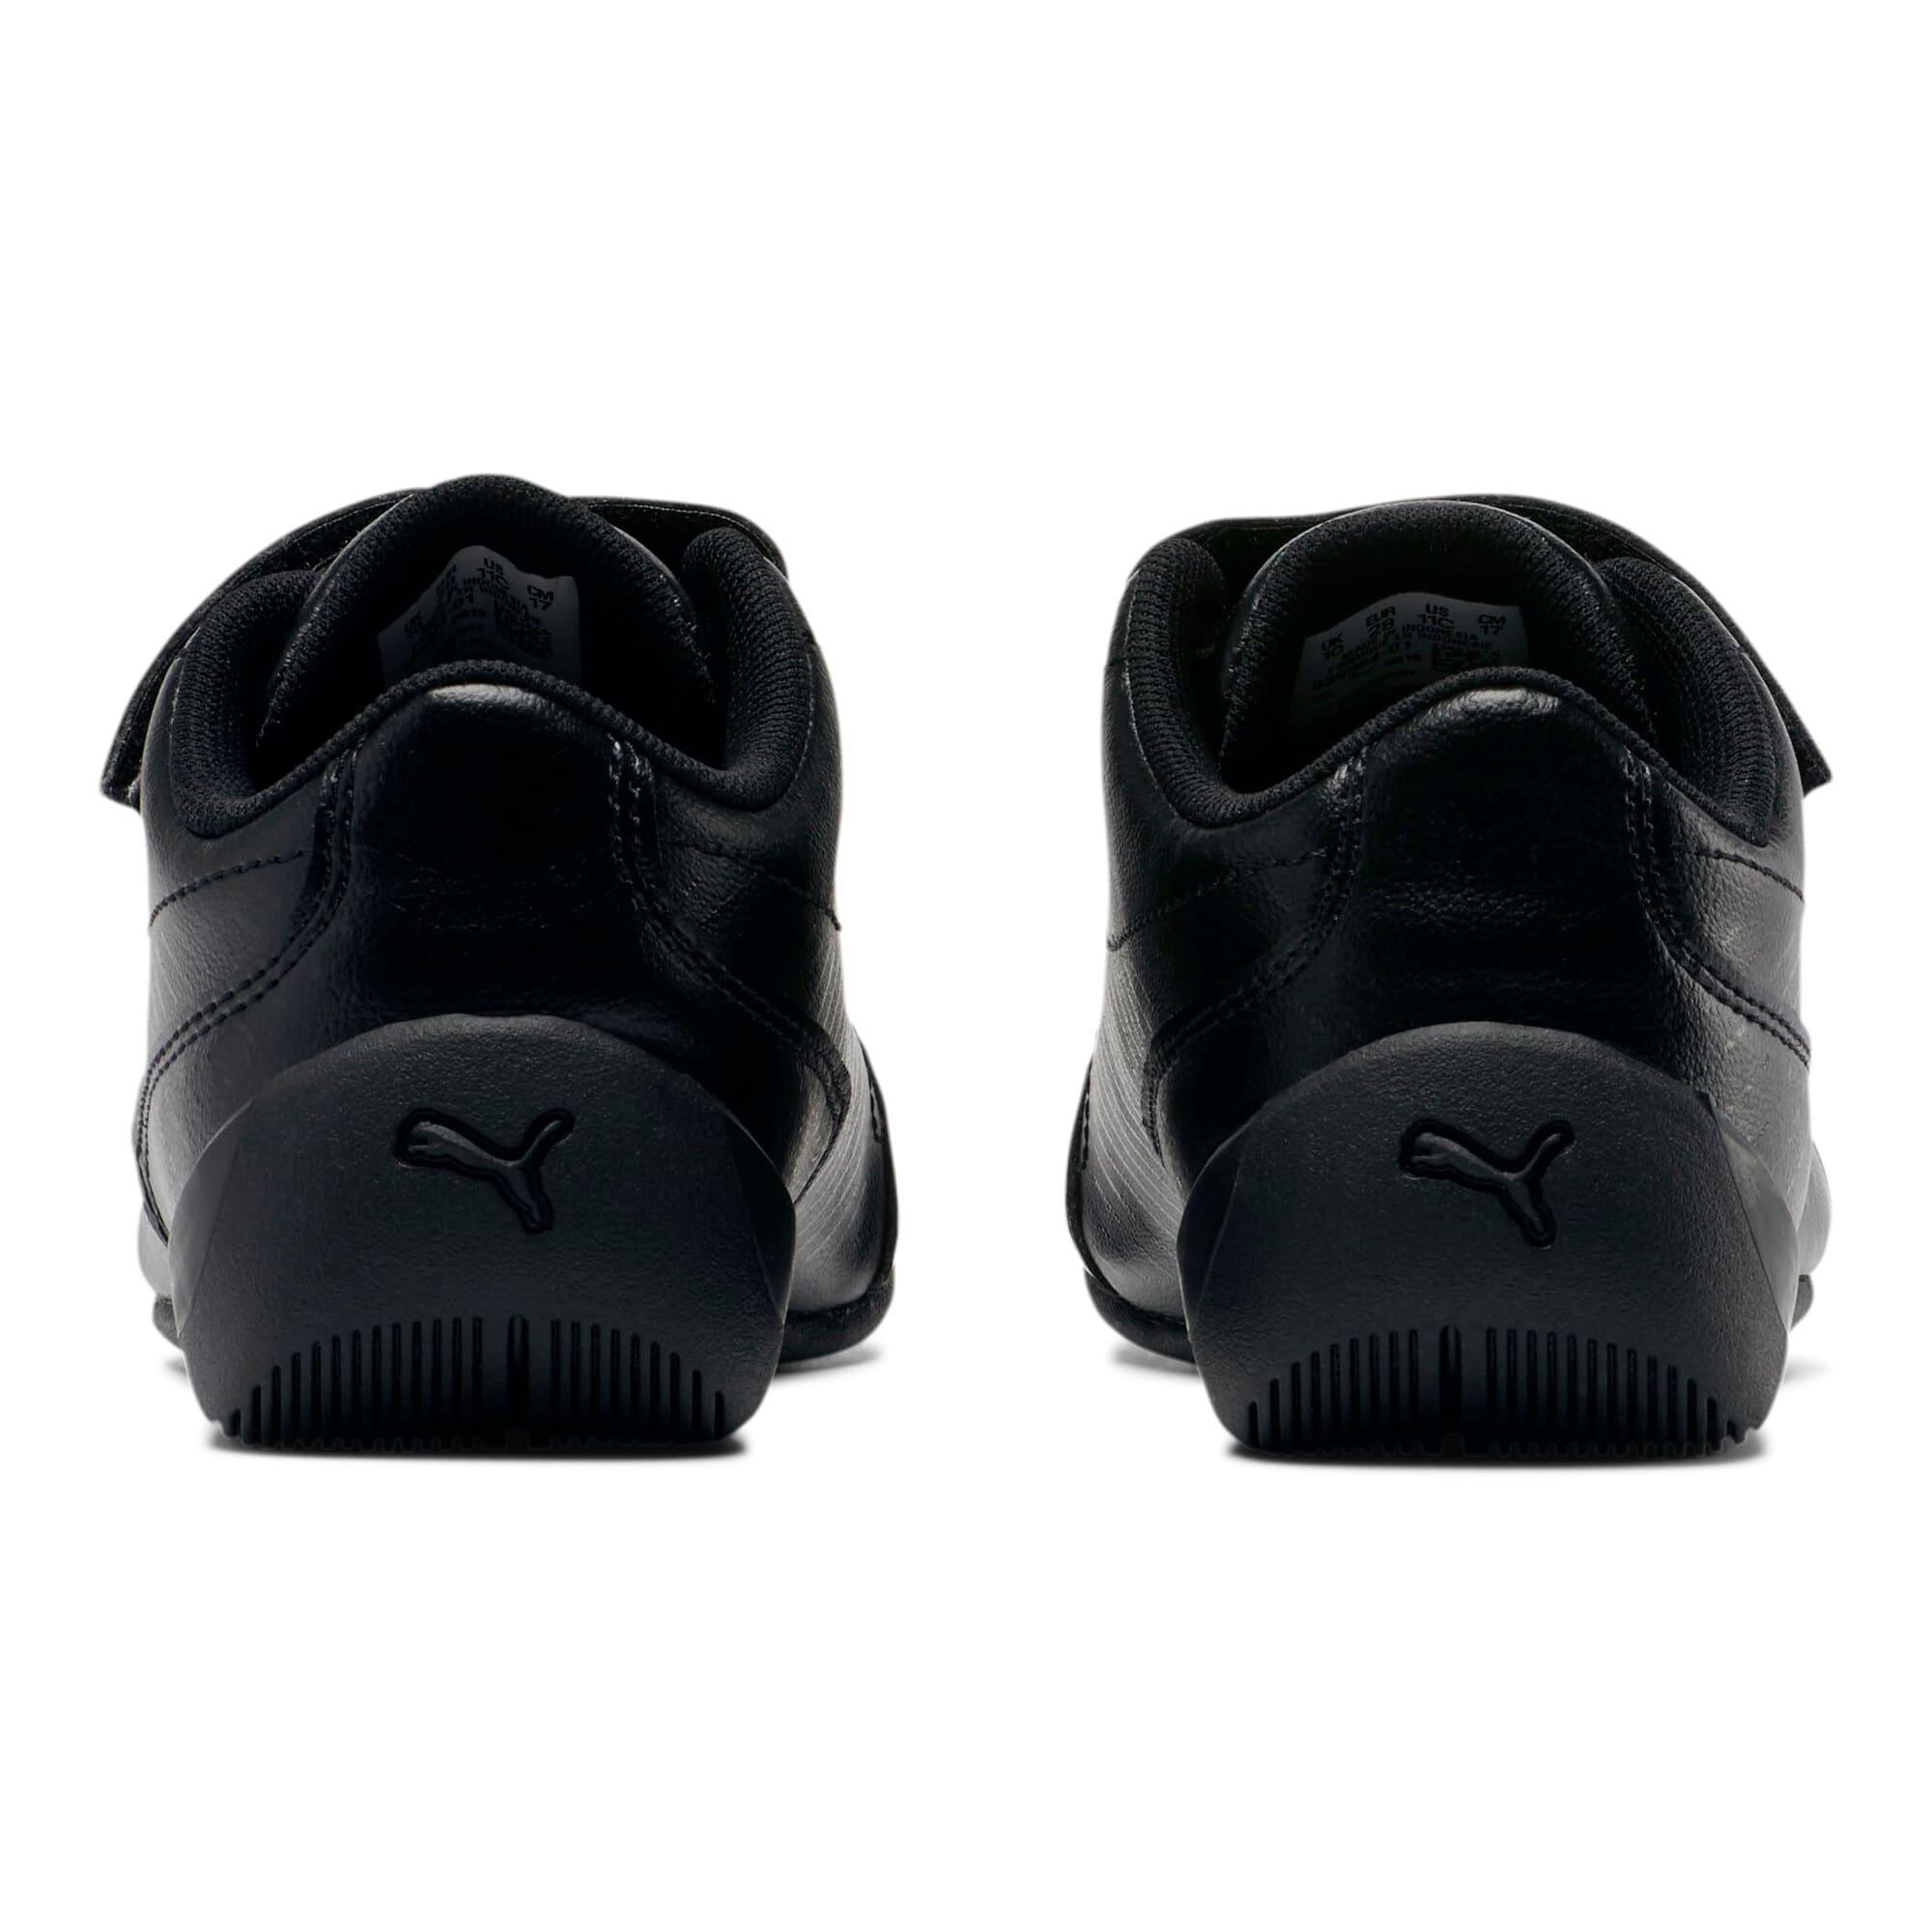 Thumbnail 3 of Drift Cat 7S Ultra Little Kids' Shoes, Puma Black-Puma Black, medium